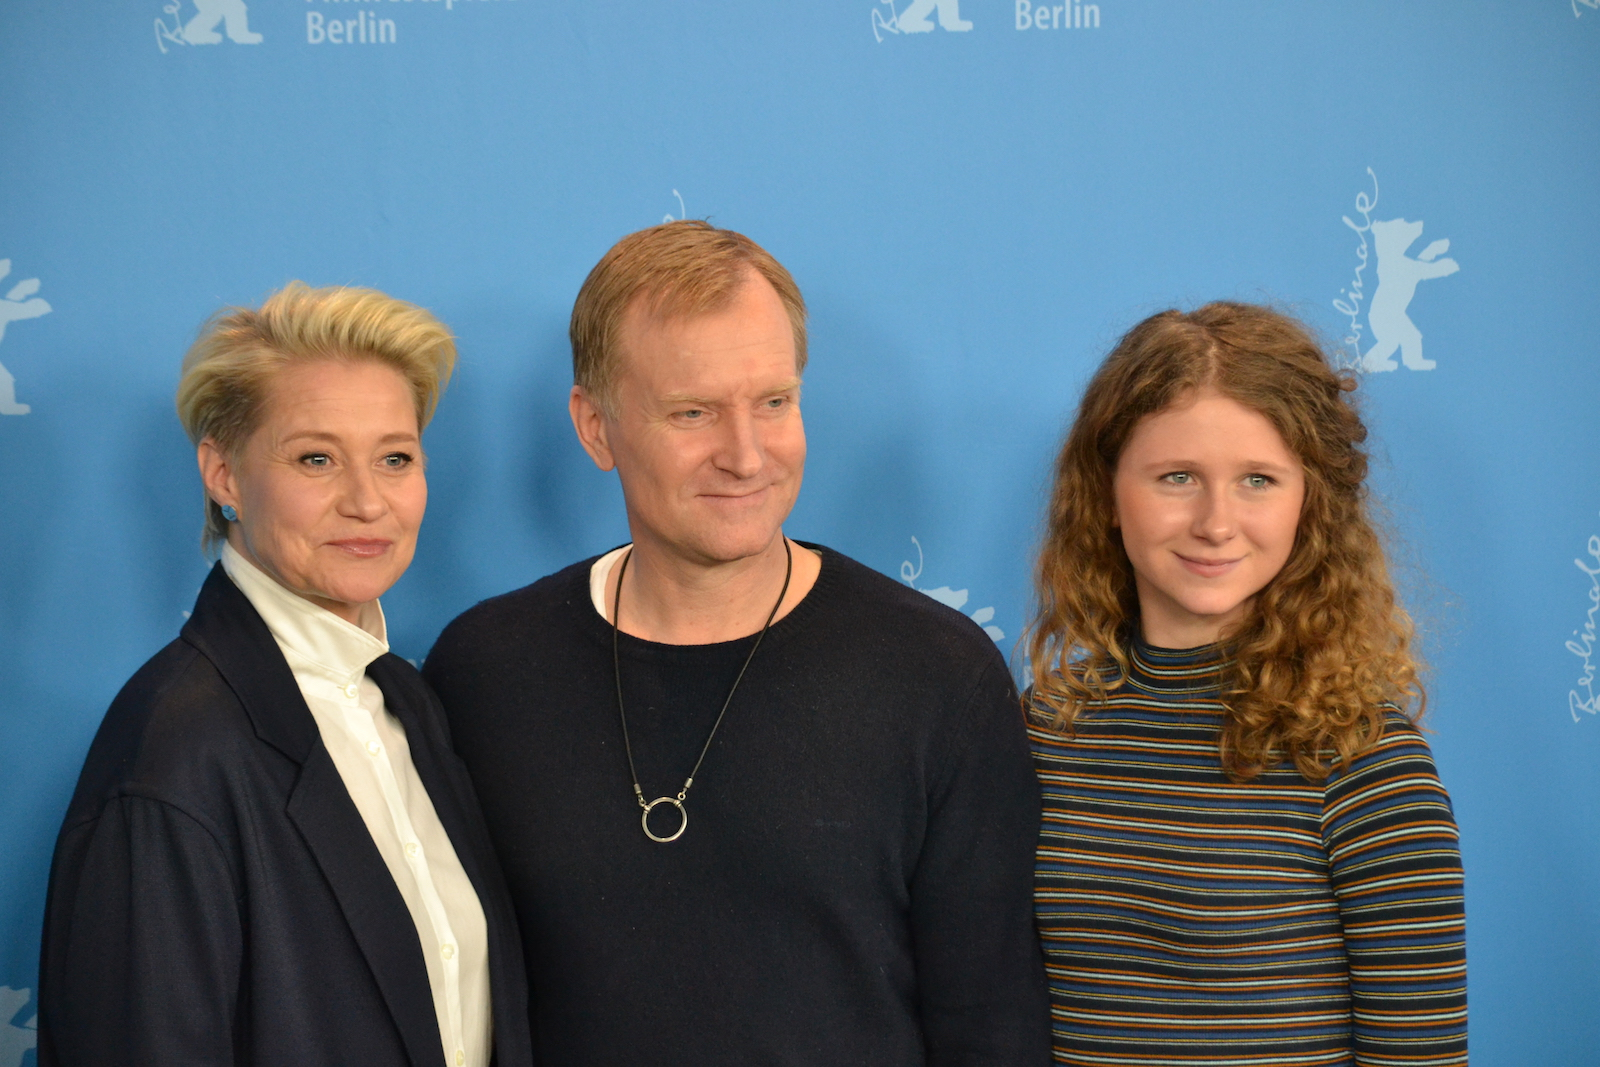 Berlino 2016: Trine Dyrholm, Martha Sofie Wallstrøm Hansen, Ulrich Thomsen al photocall di The Commune